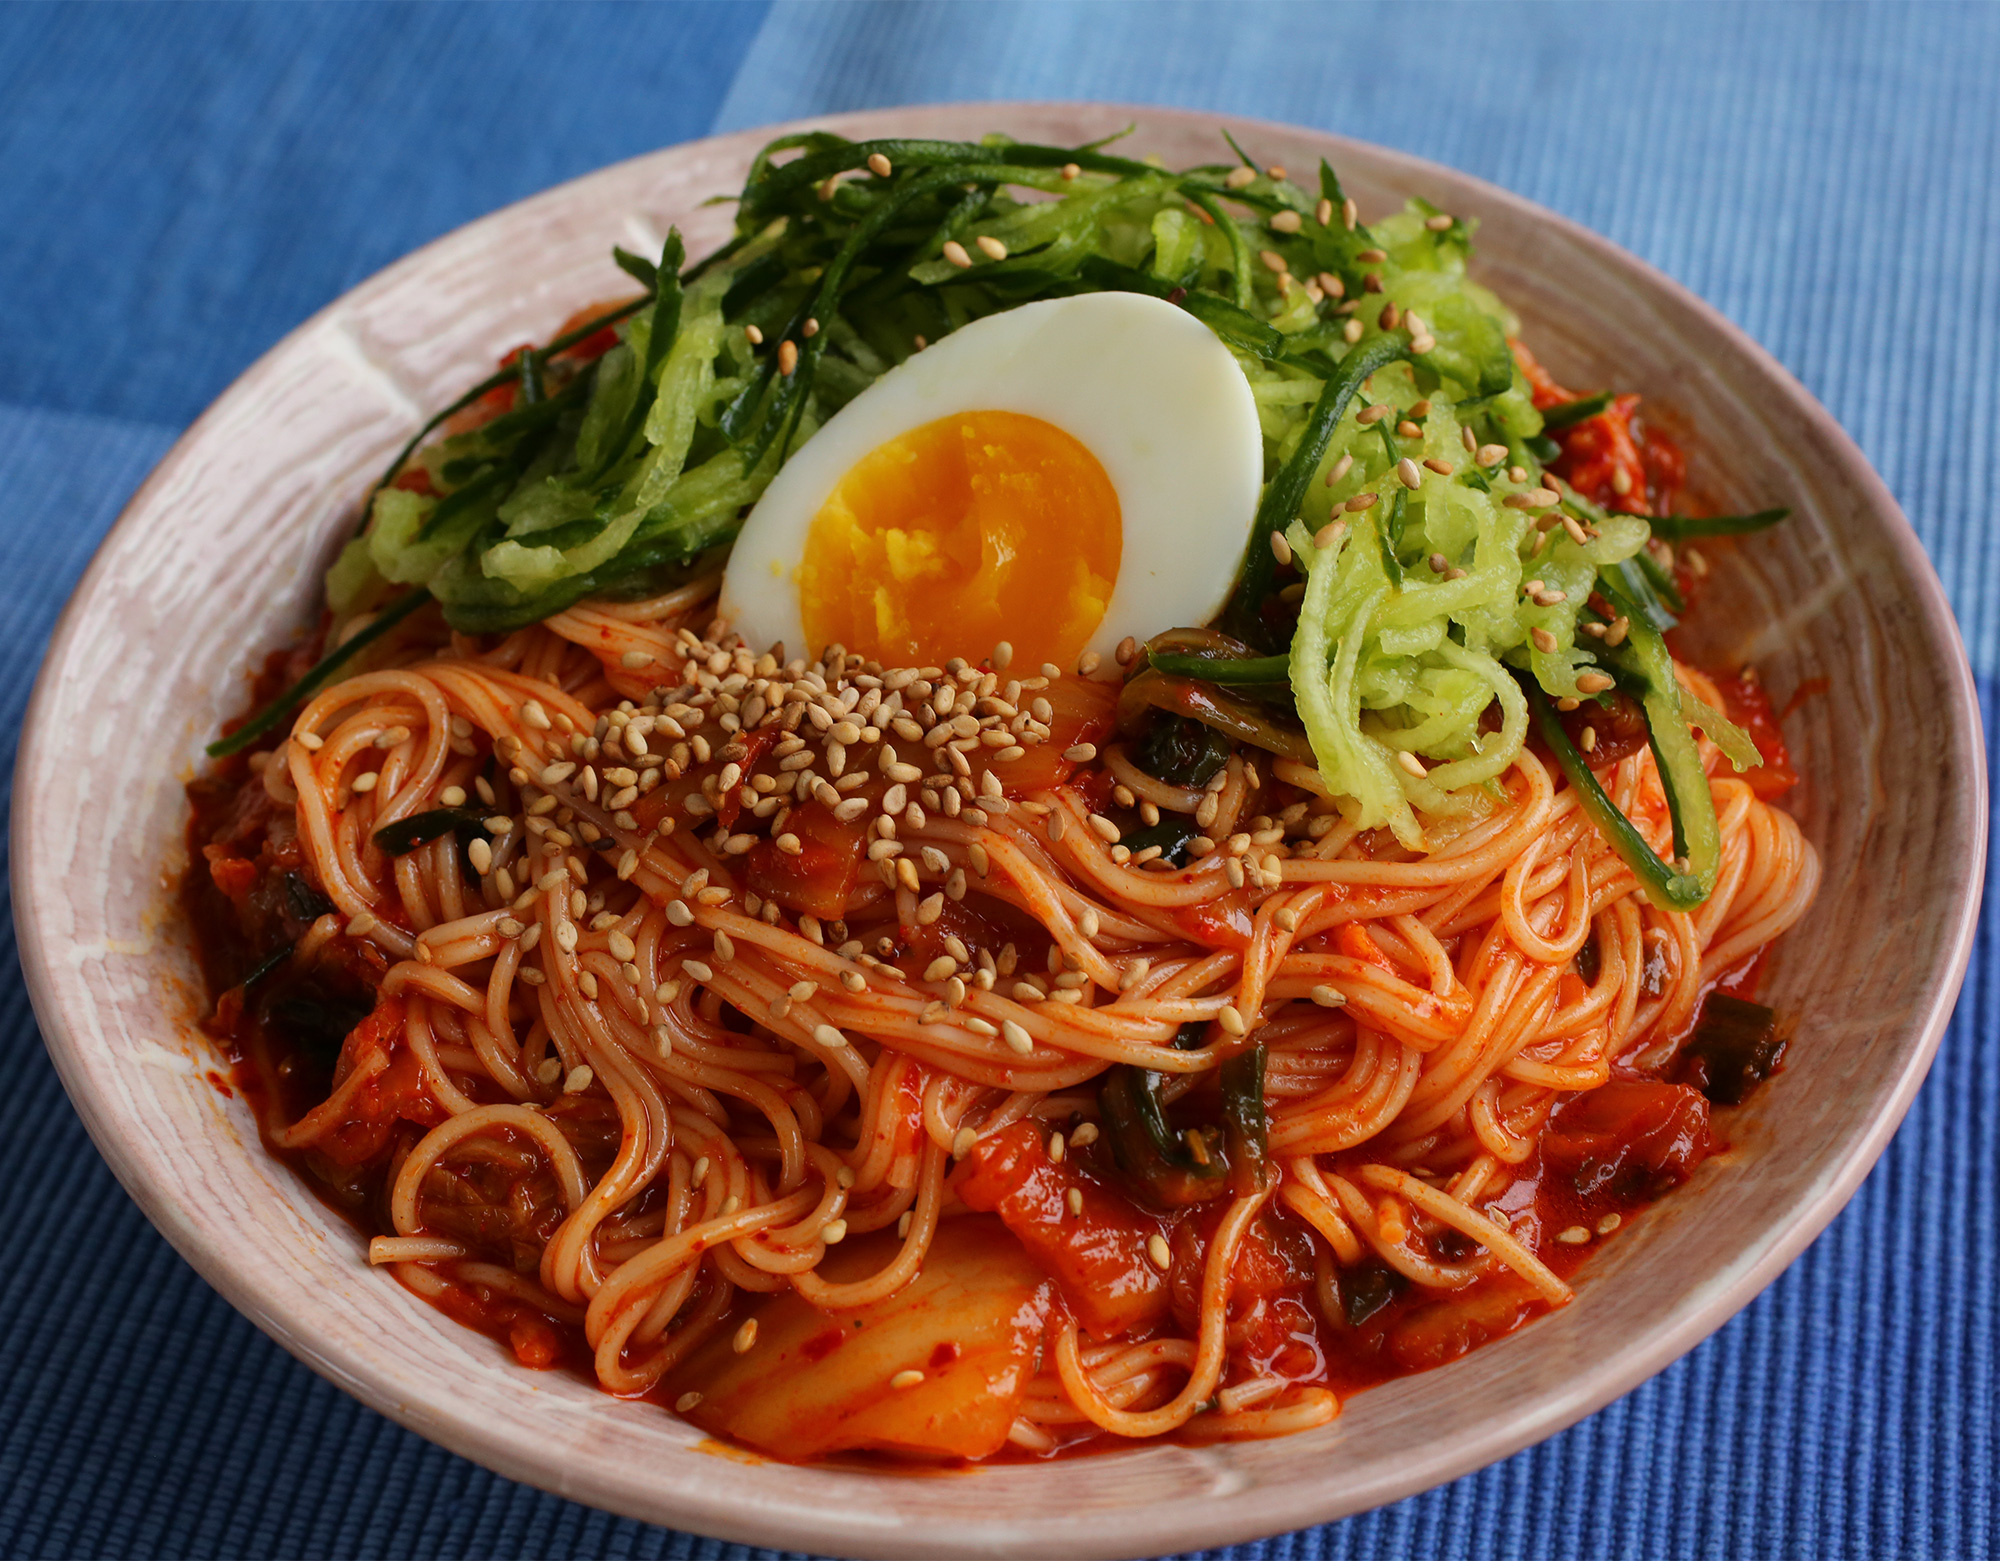 Kimchi Soba/Buckwheat Noodles 비빔국수